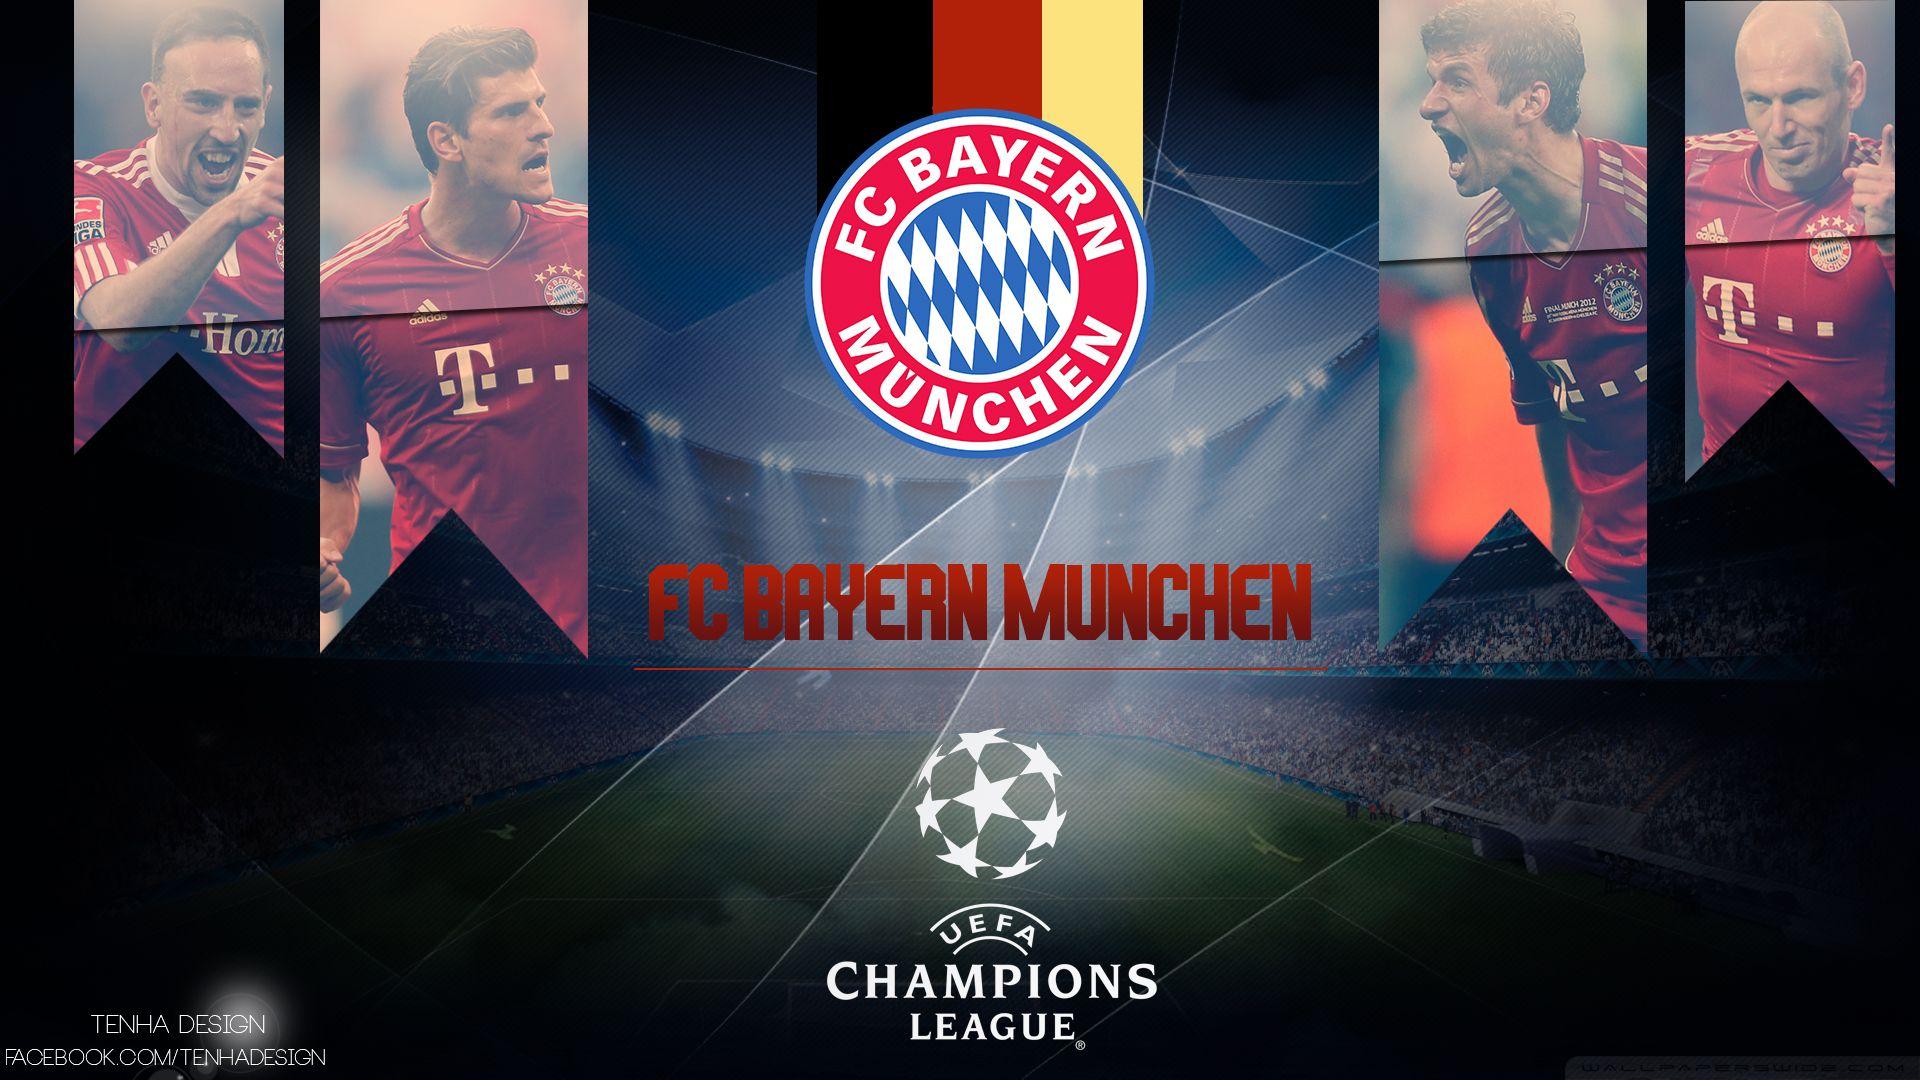 Bayern Munich Football Wallpaper バイエルン ミュンヘン バイエルンミュンヘン